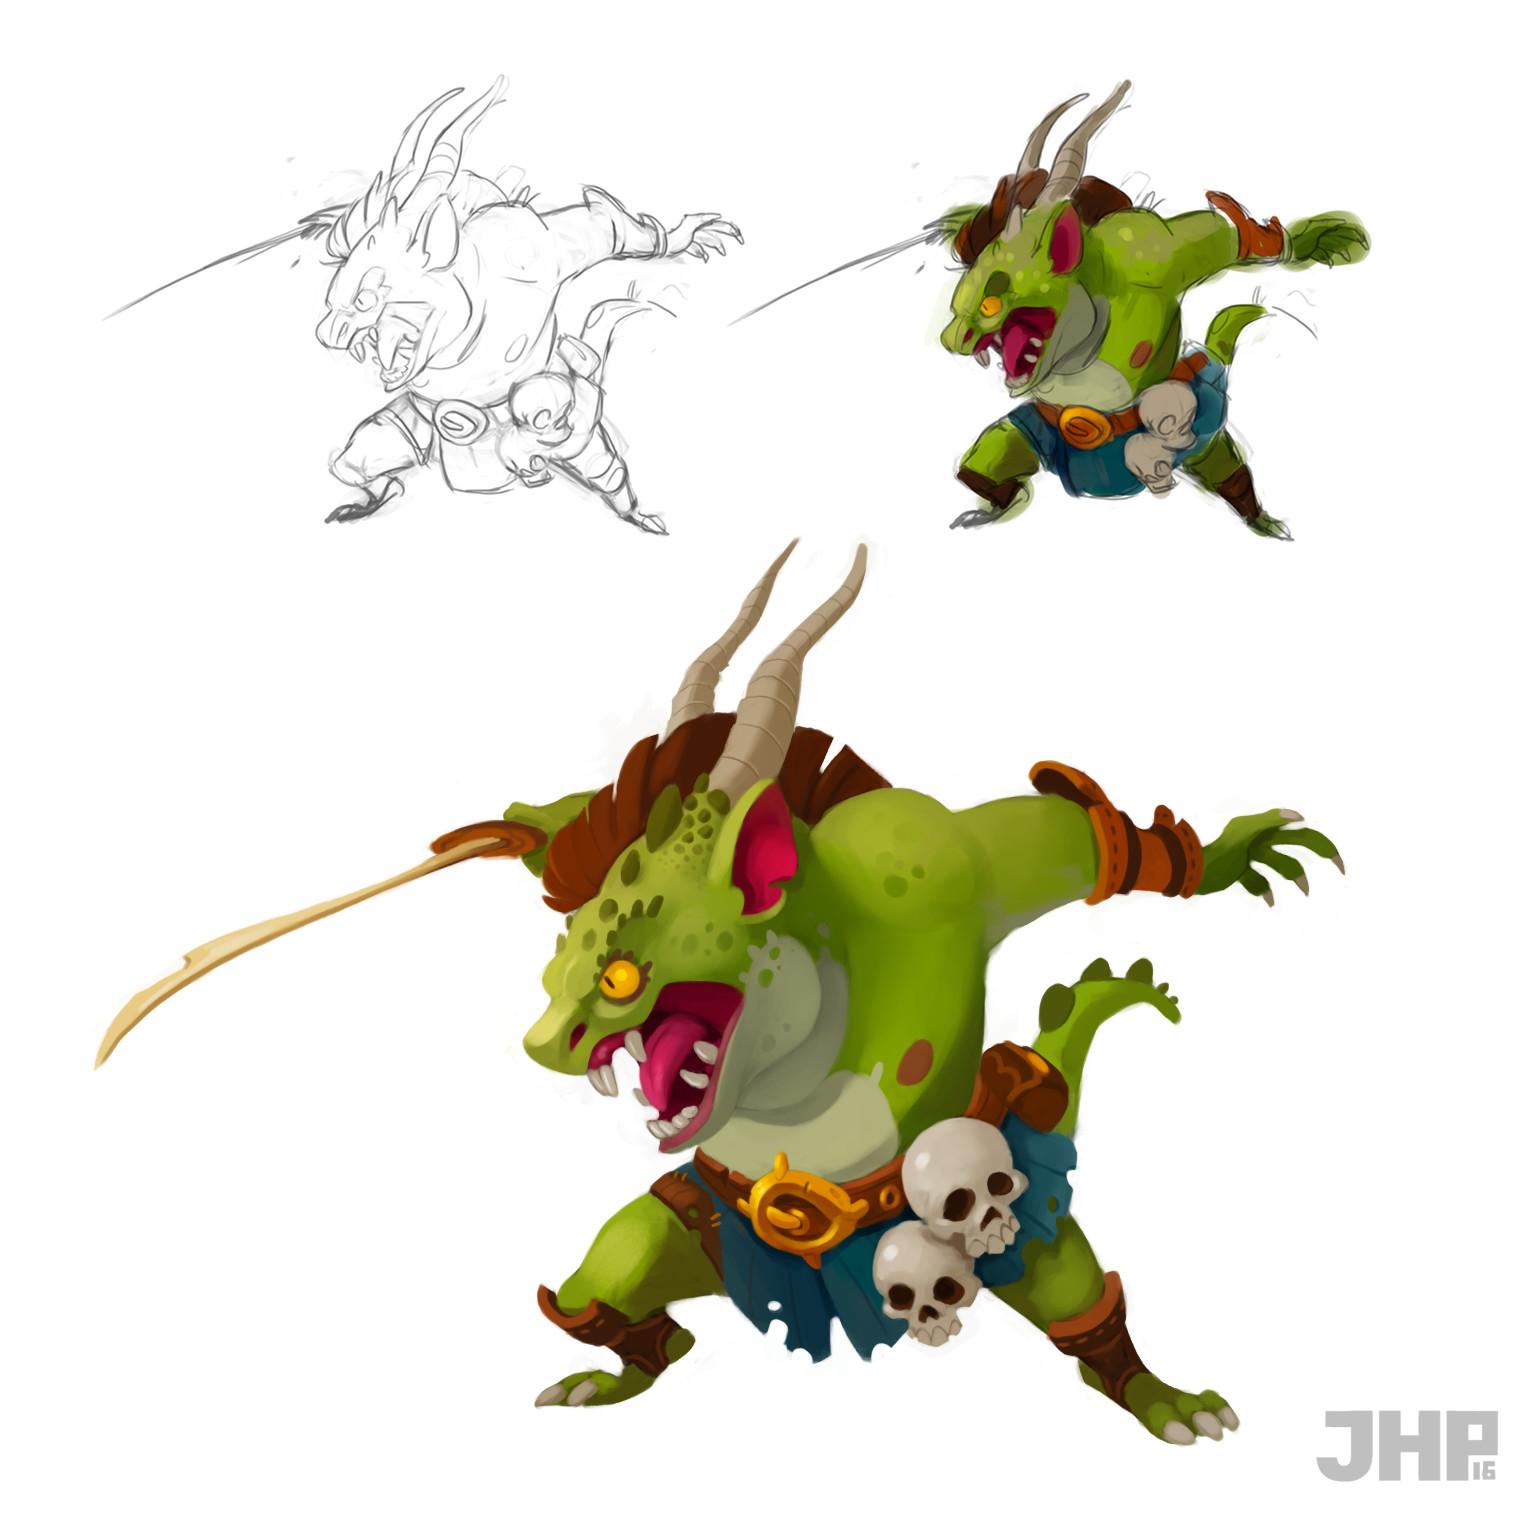 Joao henrique pacheco green creature